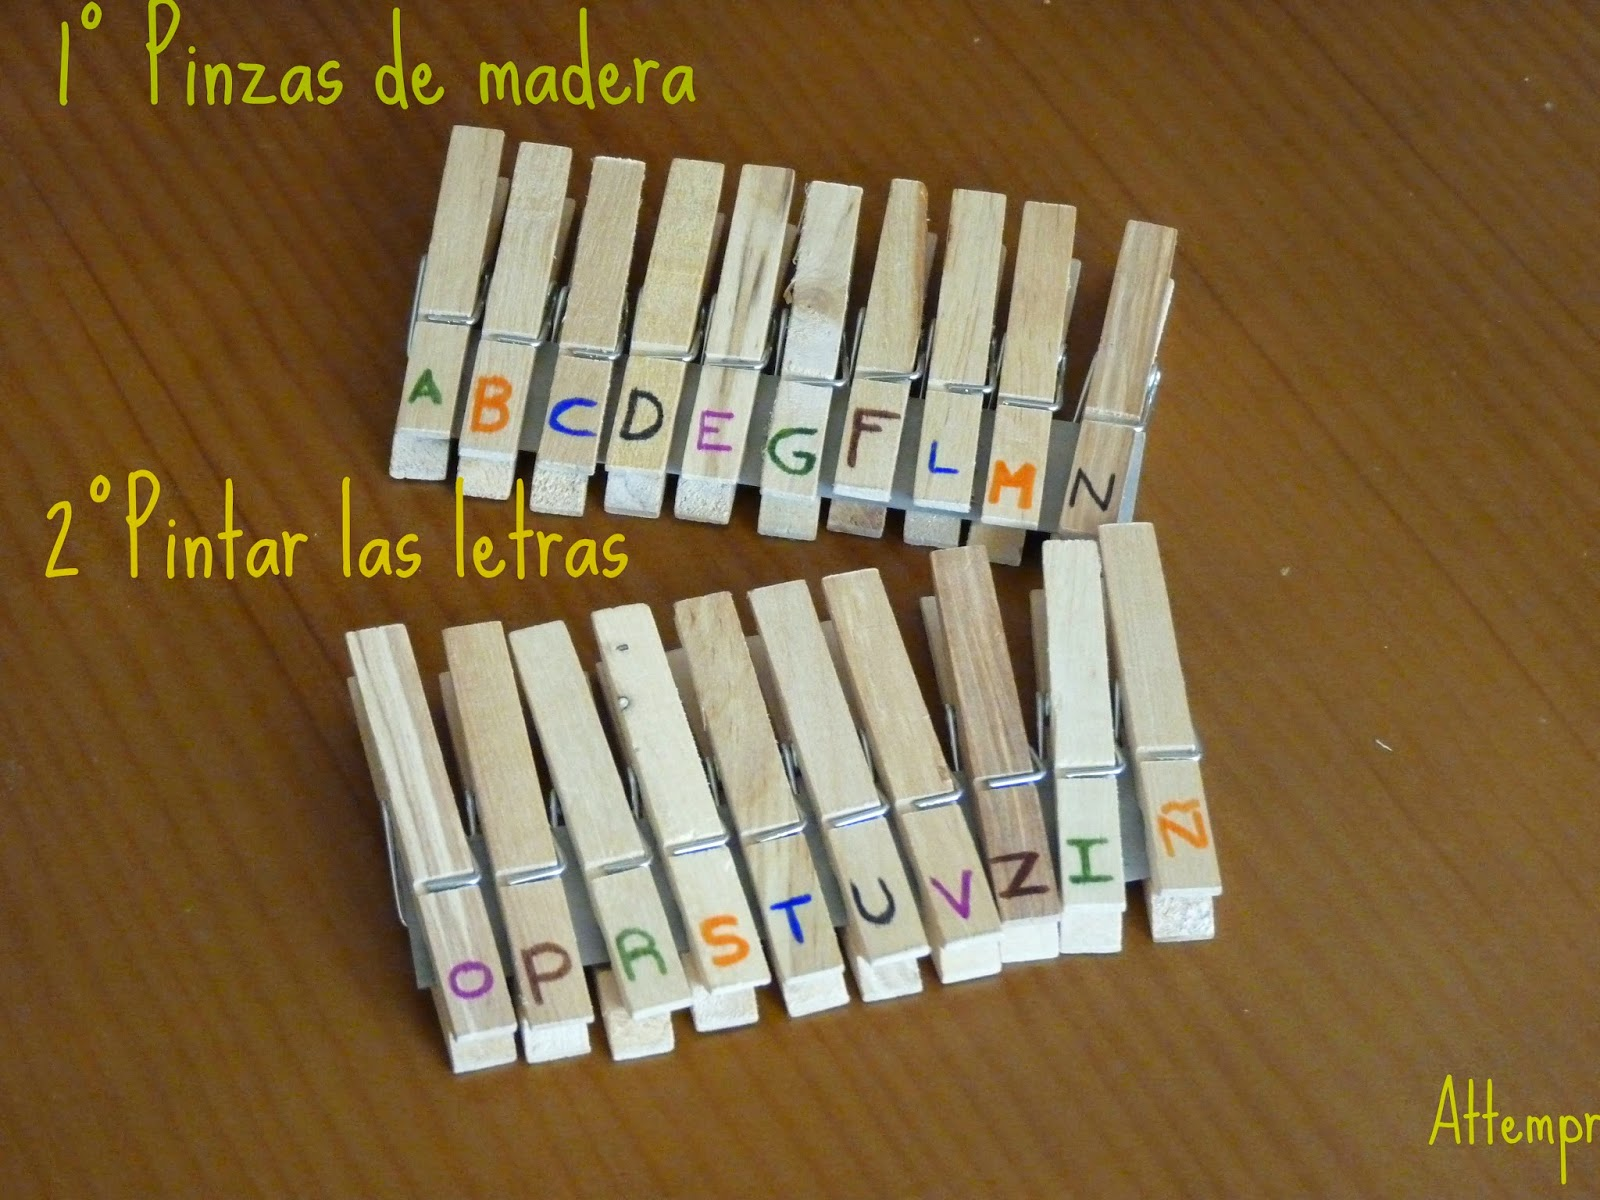 http://atempramv.blogspot.com.es/2014/05/motricidad-fina-pinzas.html